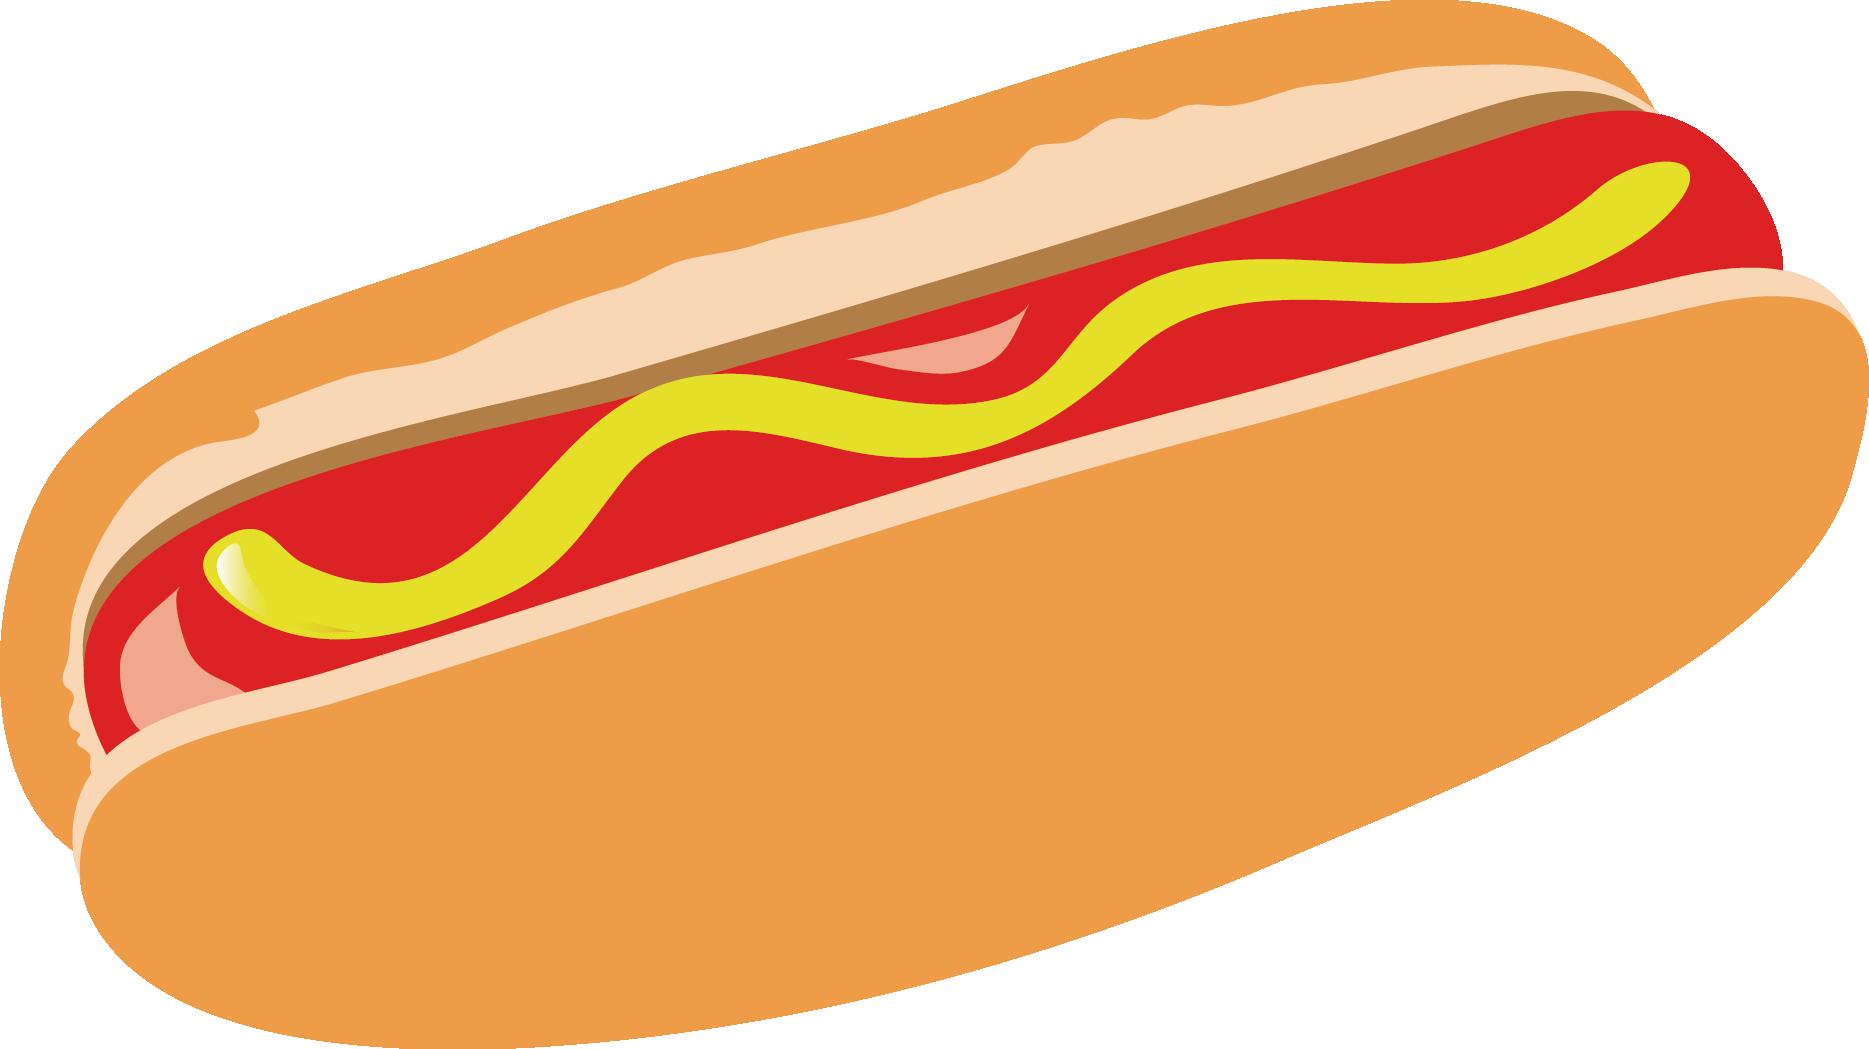 Hamburger and hot dog clipart clip art stock Hot dog Breakfast Hamburger Fast food - Ham breakfast 1869*1049 ... clip art stock